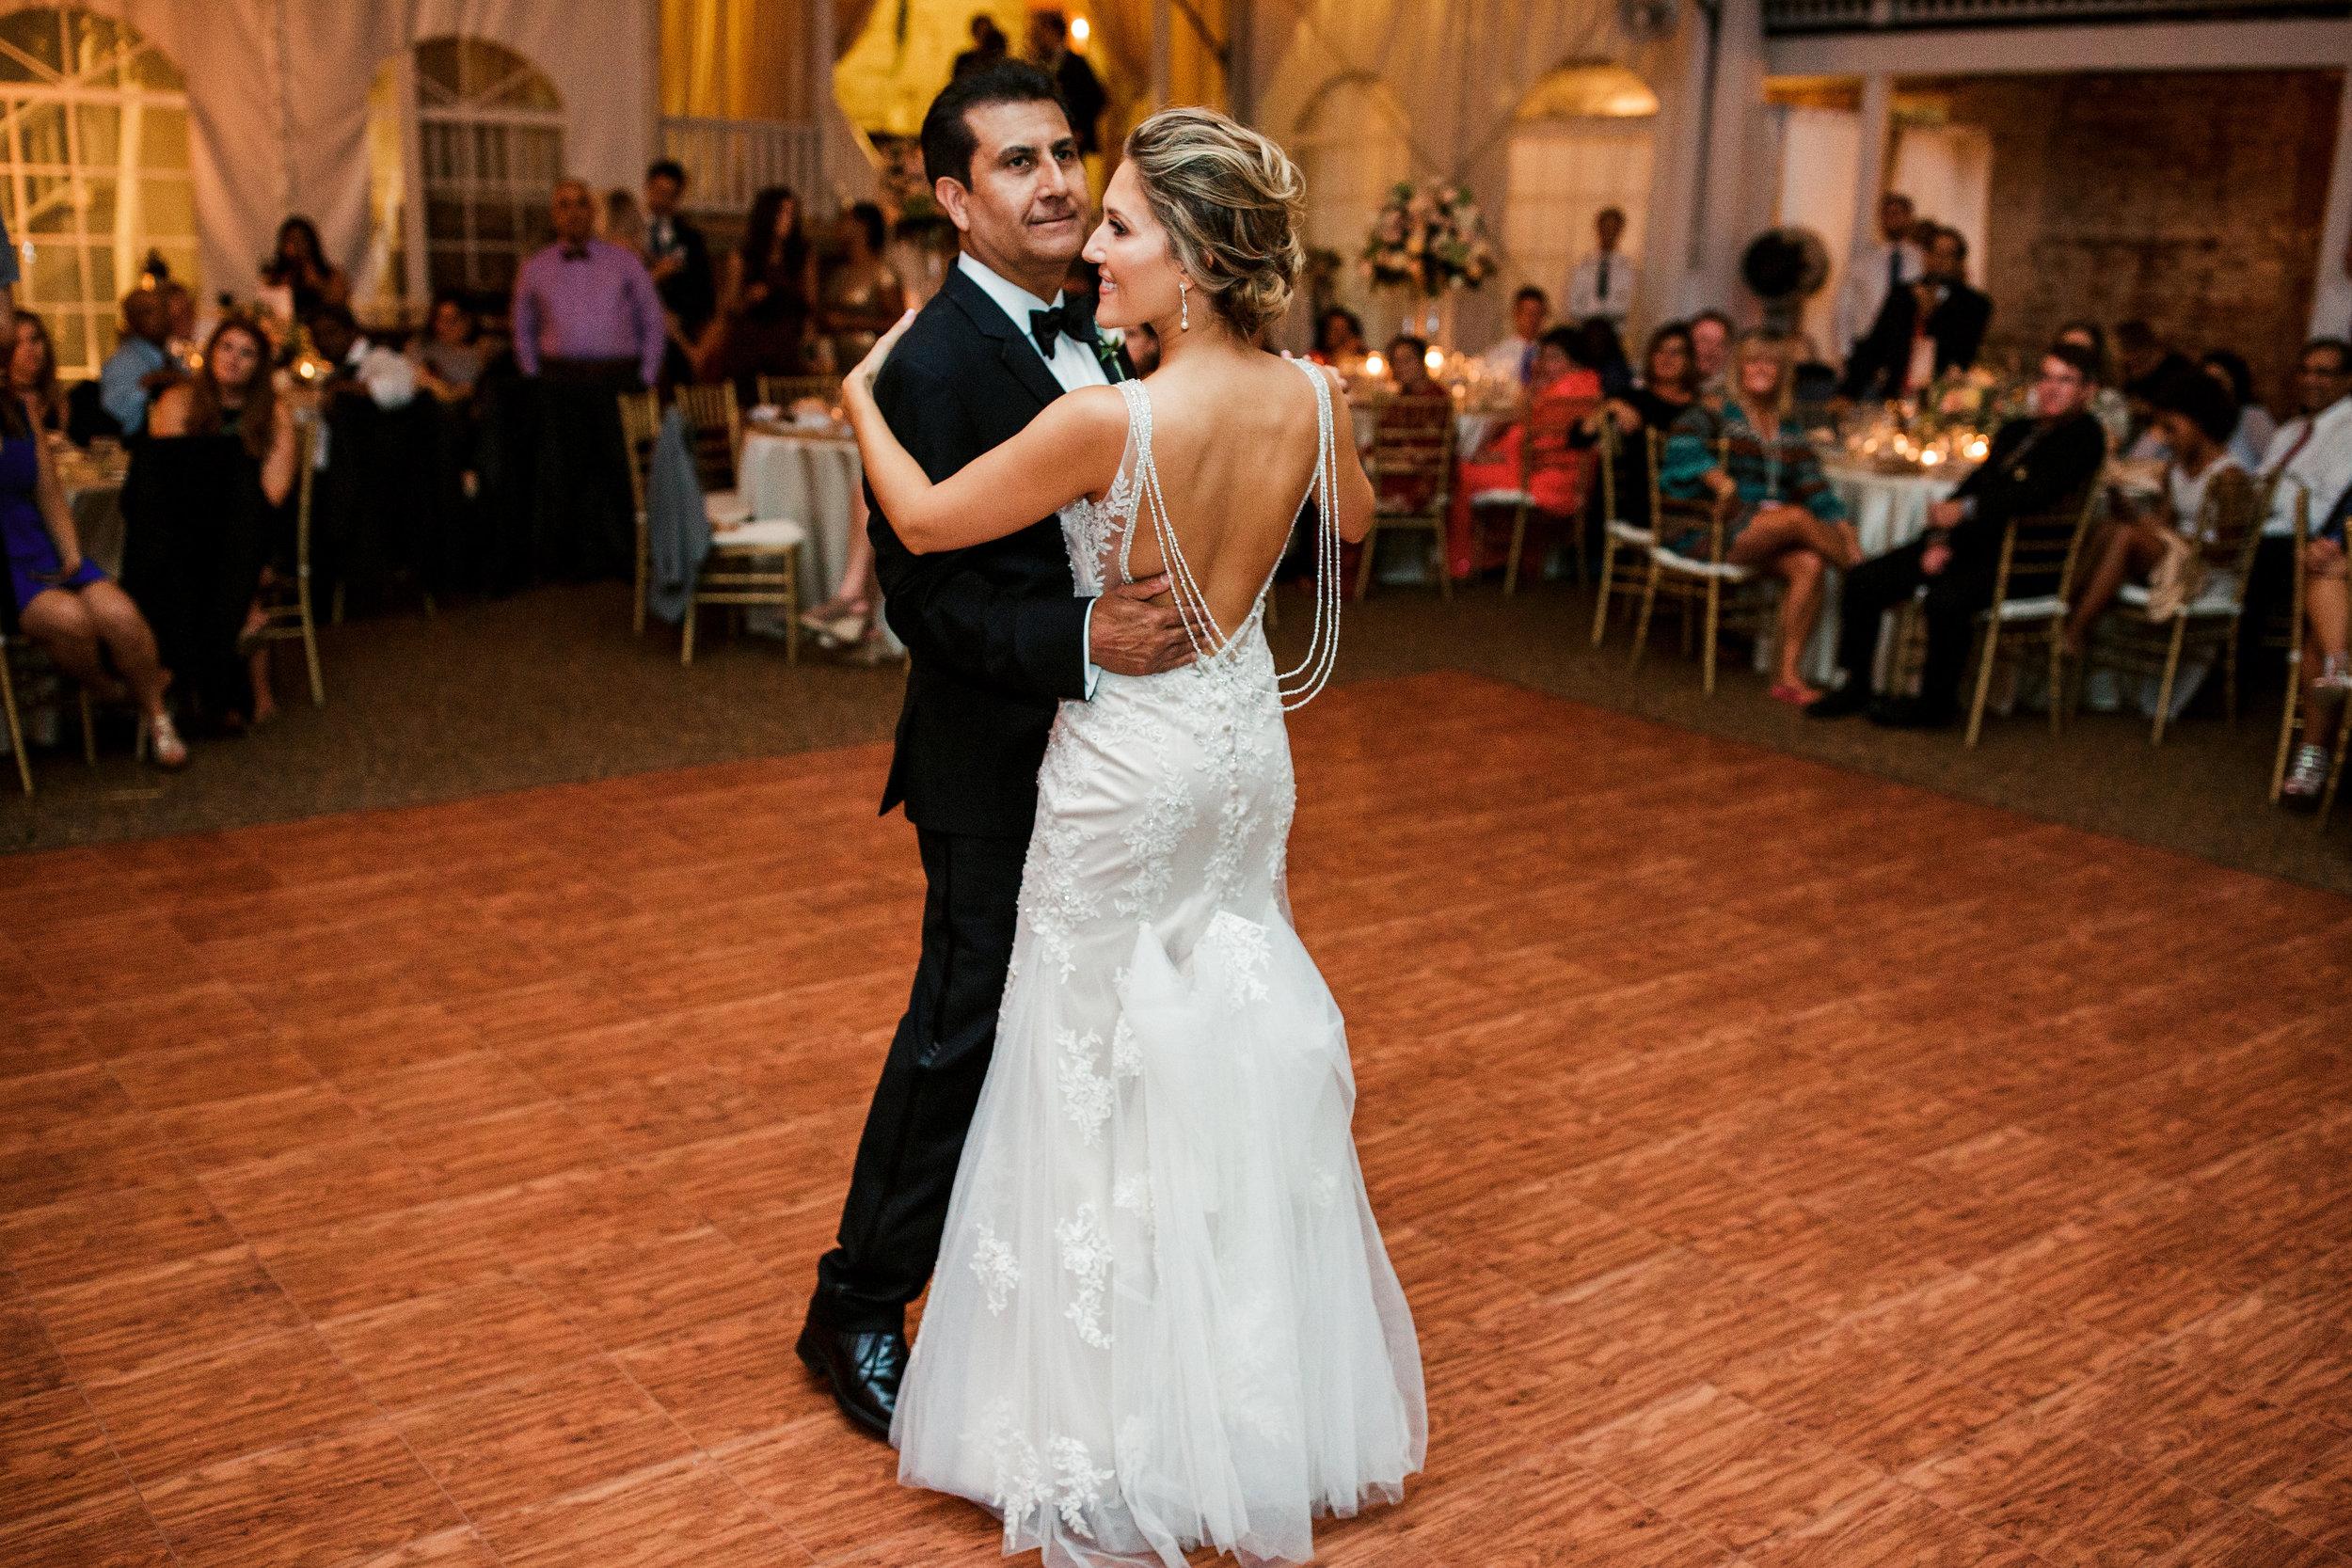 Riverwood-Mansion-Wedding42.jpg